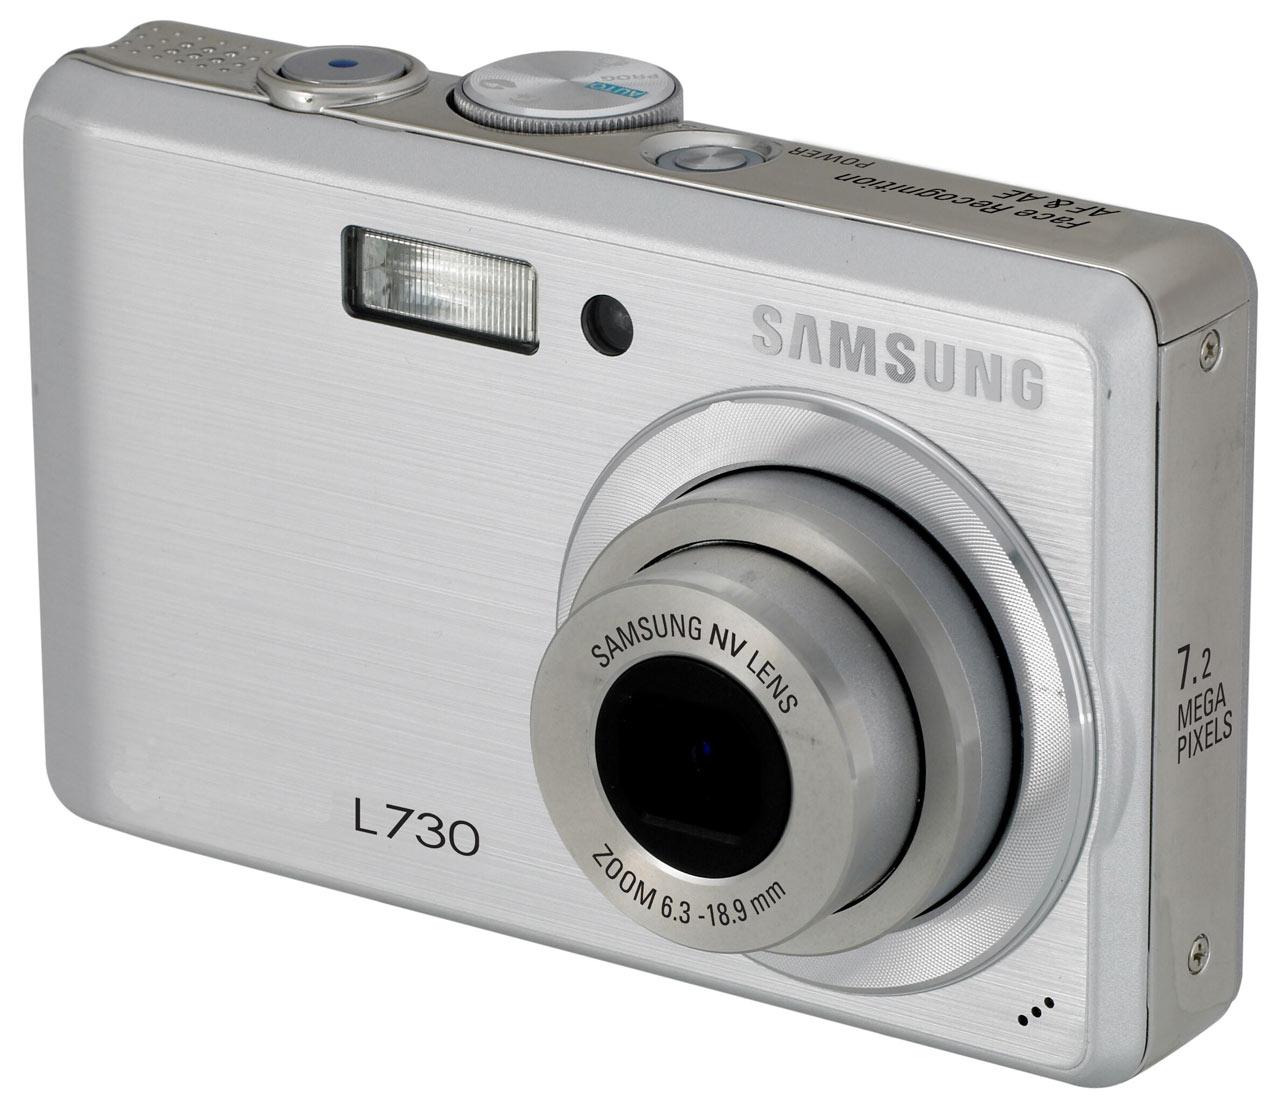 Samsung L 730 Image